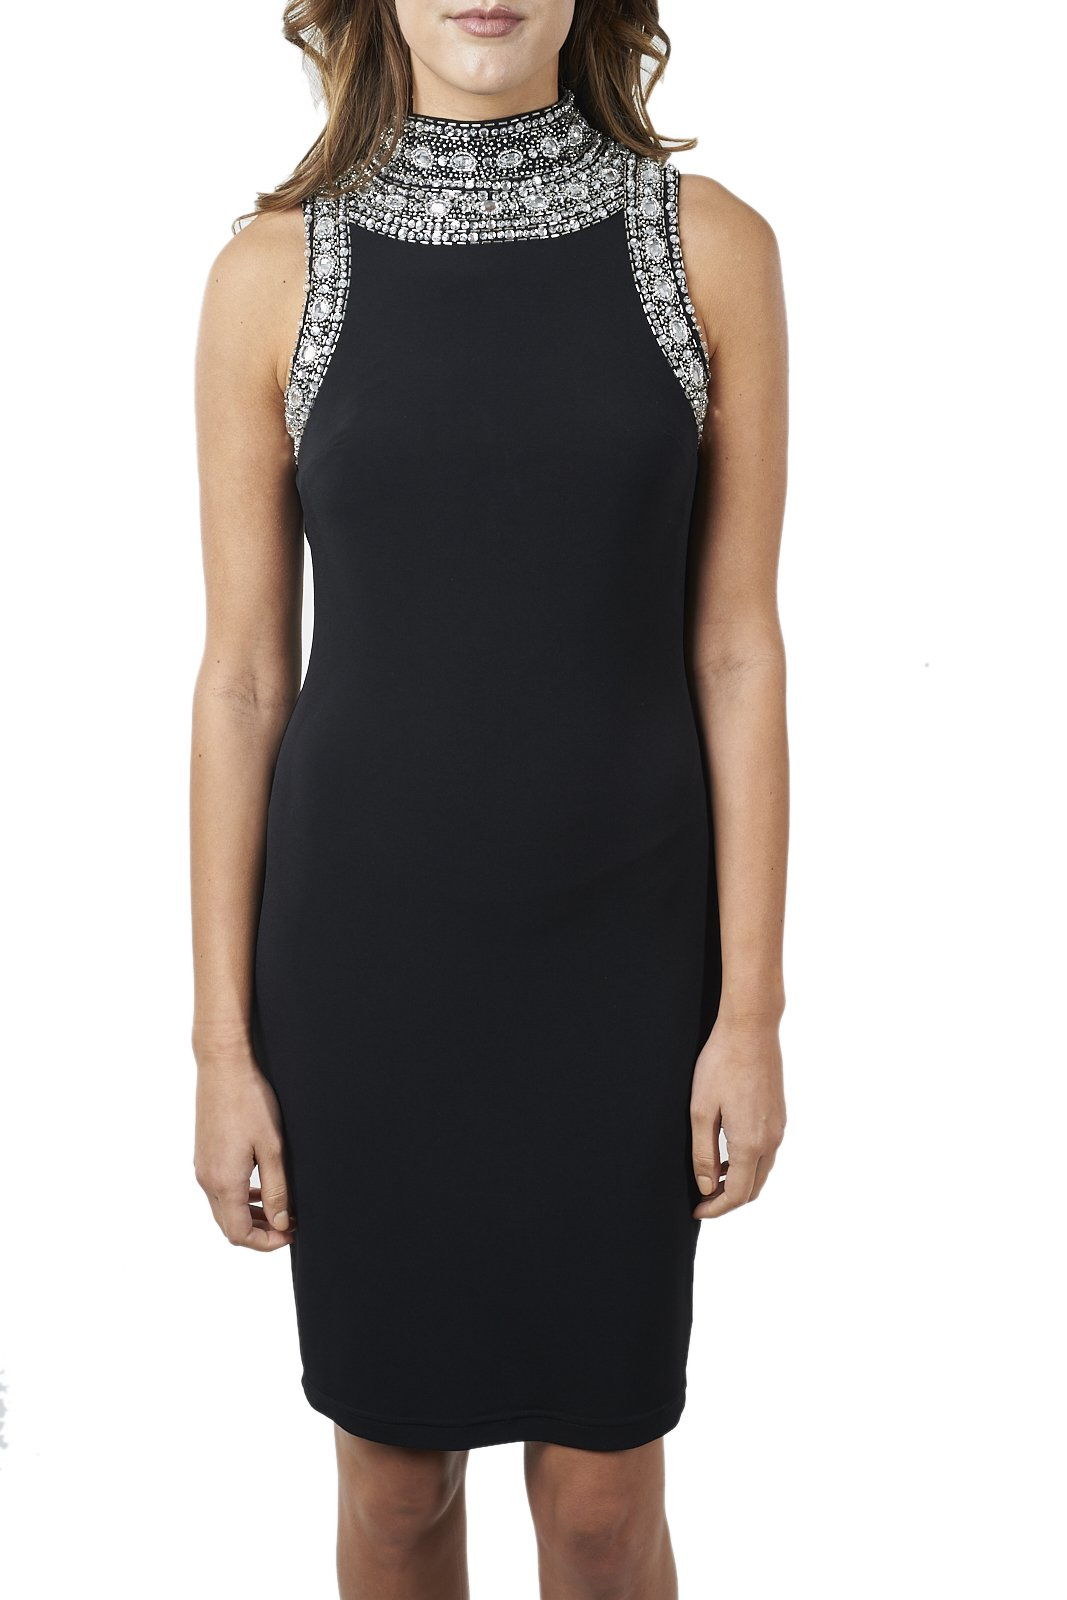 Joseph Ribkoff Black Sleeveless Jeweled Halter Neck Dress Style 171950 - Size 12